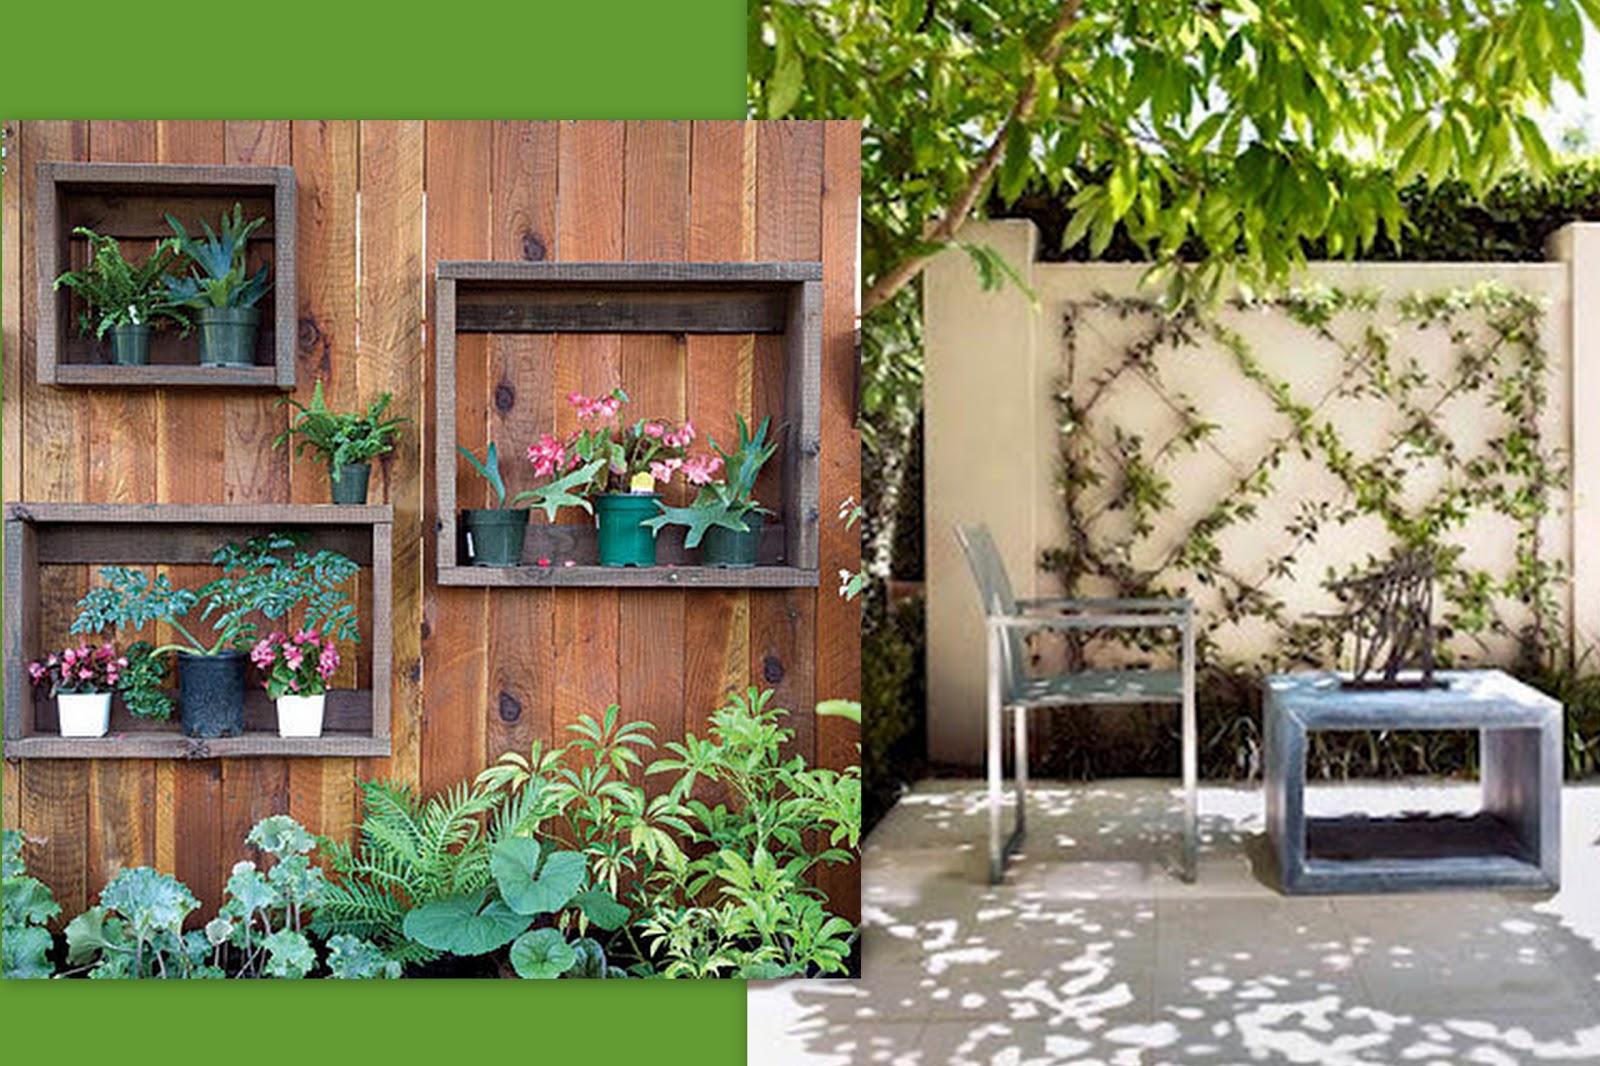 jardim vertical moderno:Jardim Vertical